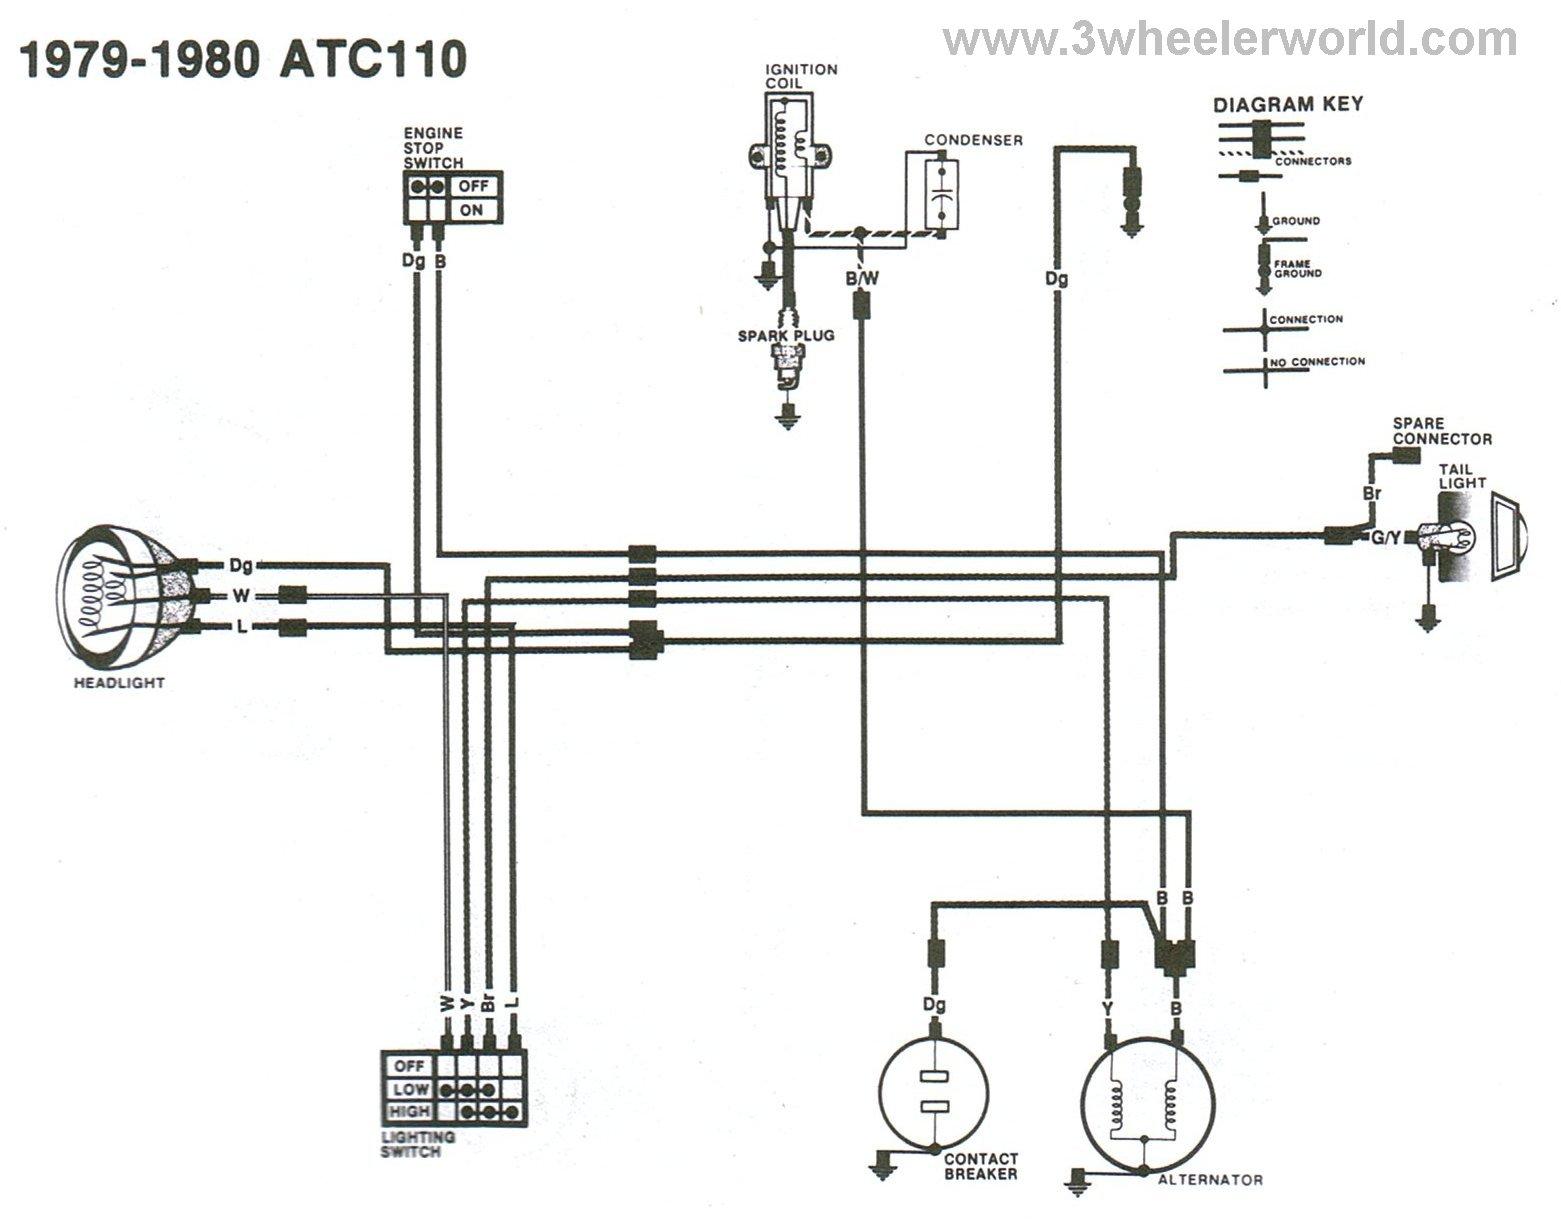 ez_4486] honda trail 90 wiring diagram together with 84 honda 125 atc  wiring schematic wiring  xtern oxyl terst benol stica nnigh weasi emba mohammedshrine librar wiring  101